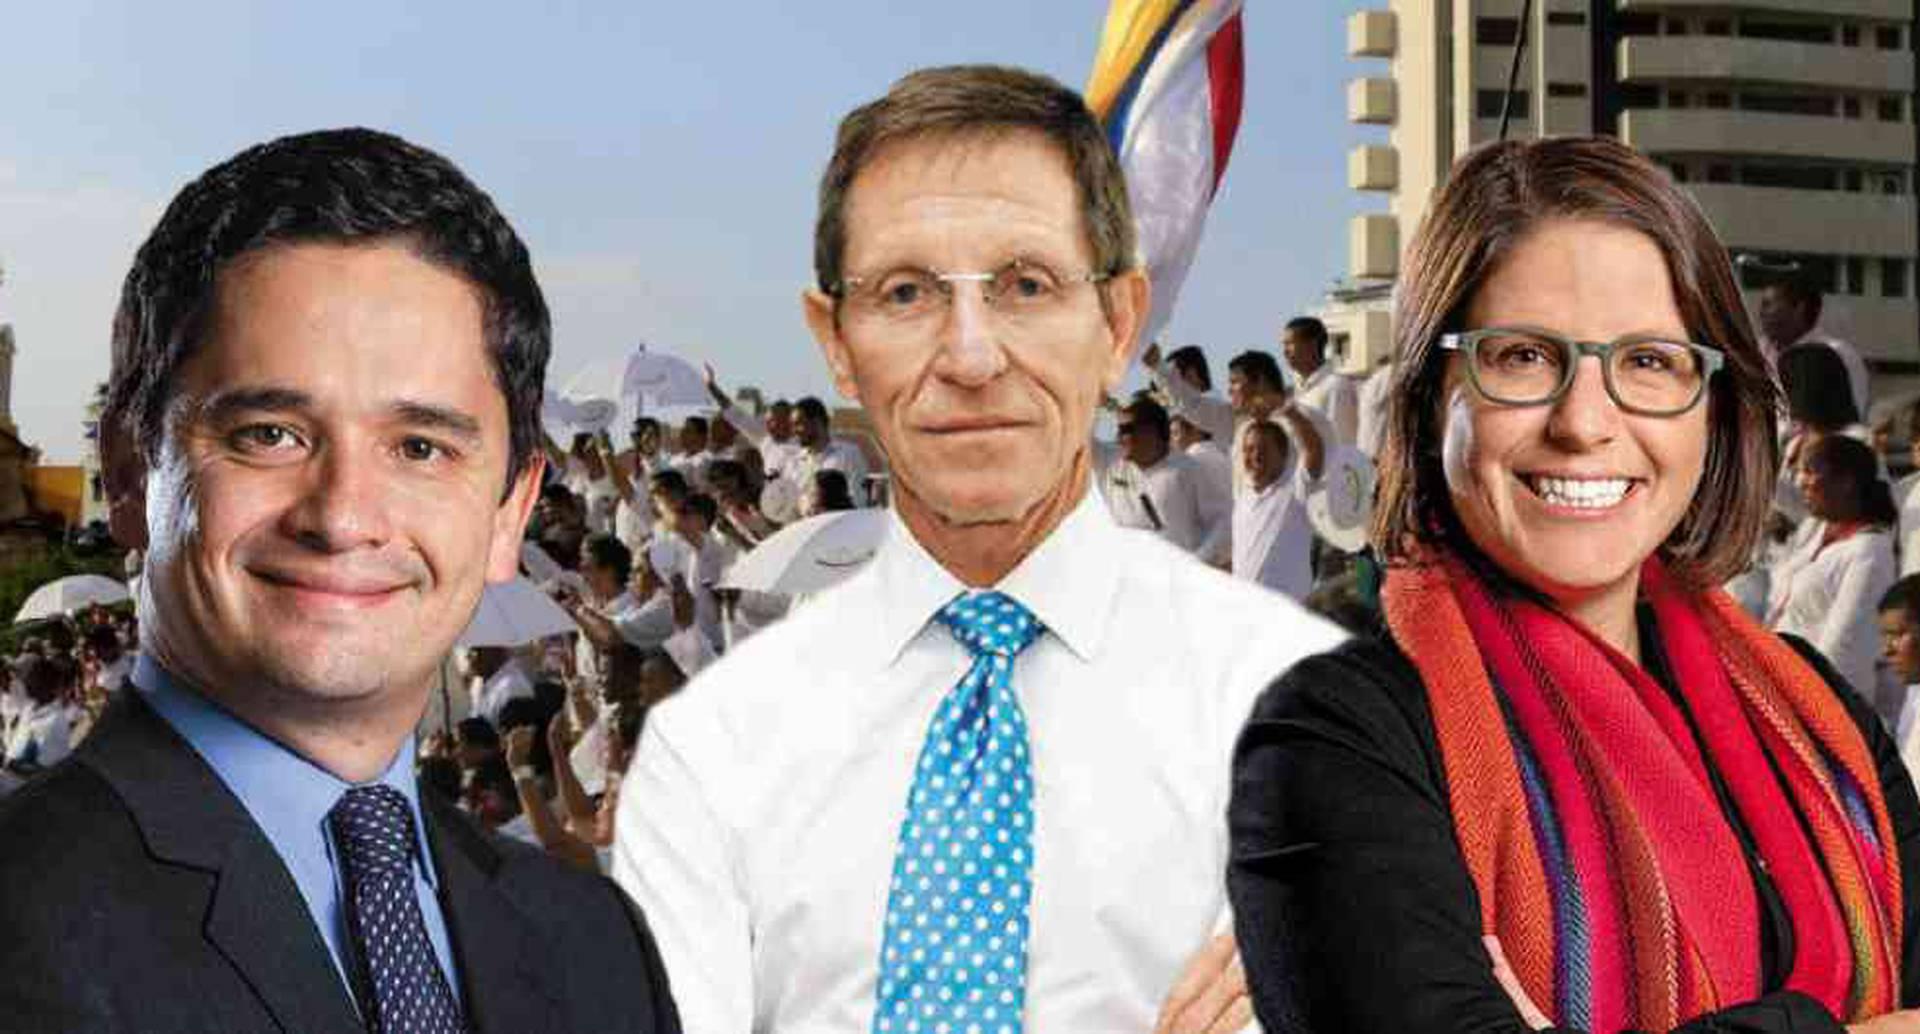 Emilio Archila, Juanita Goebertus y José Daniel López.